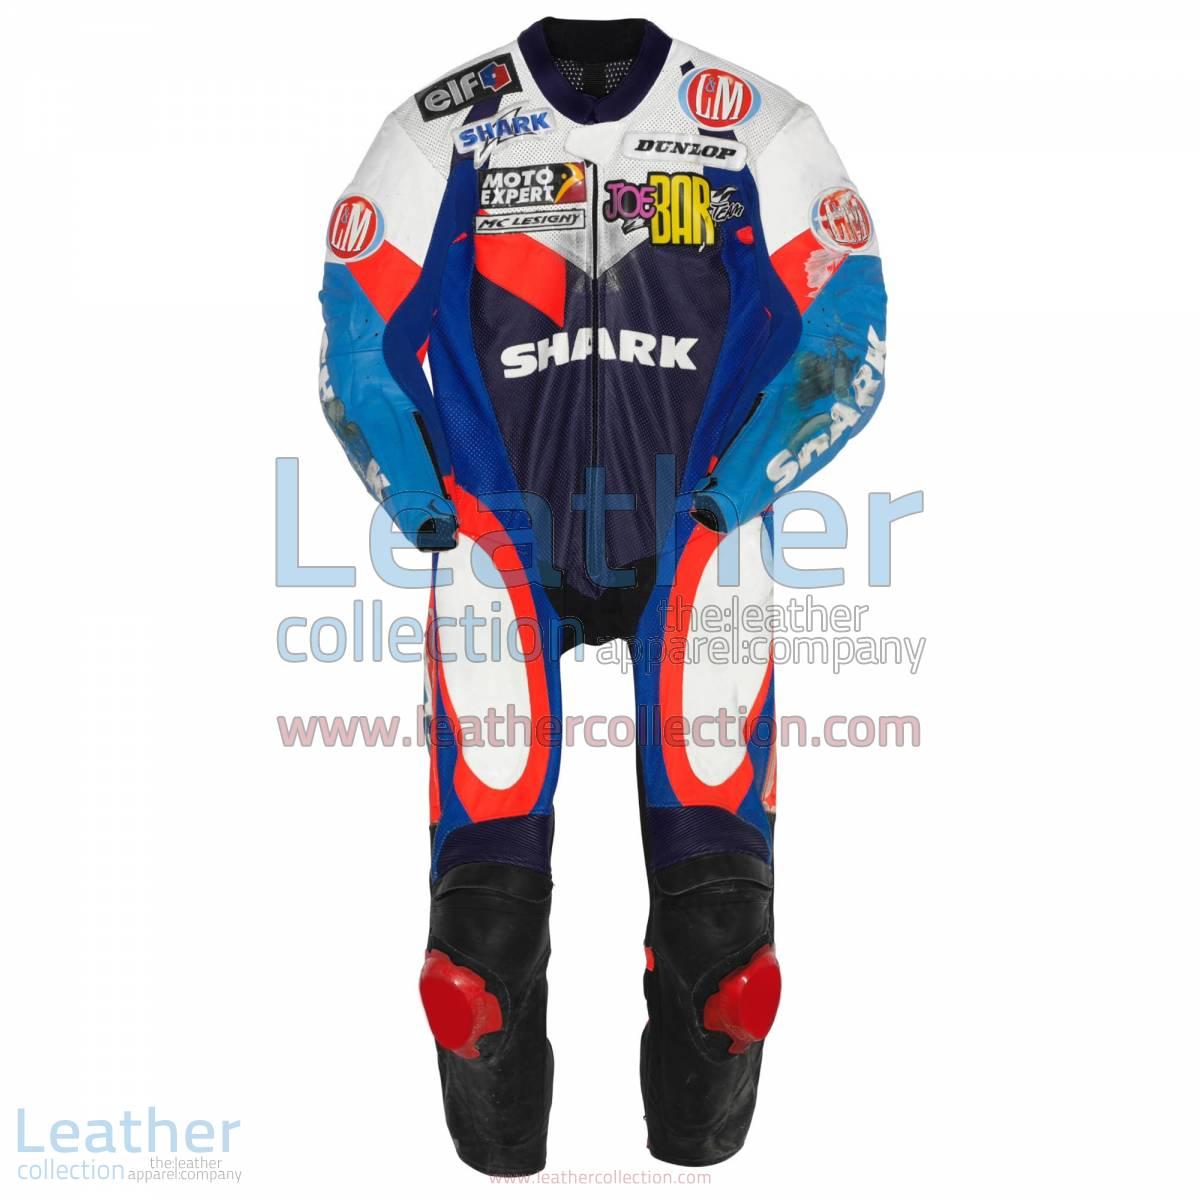 Randi De Puniet Aprilia GP 1999 Leather Suit | aprilia suit